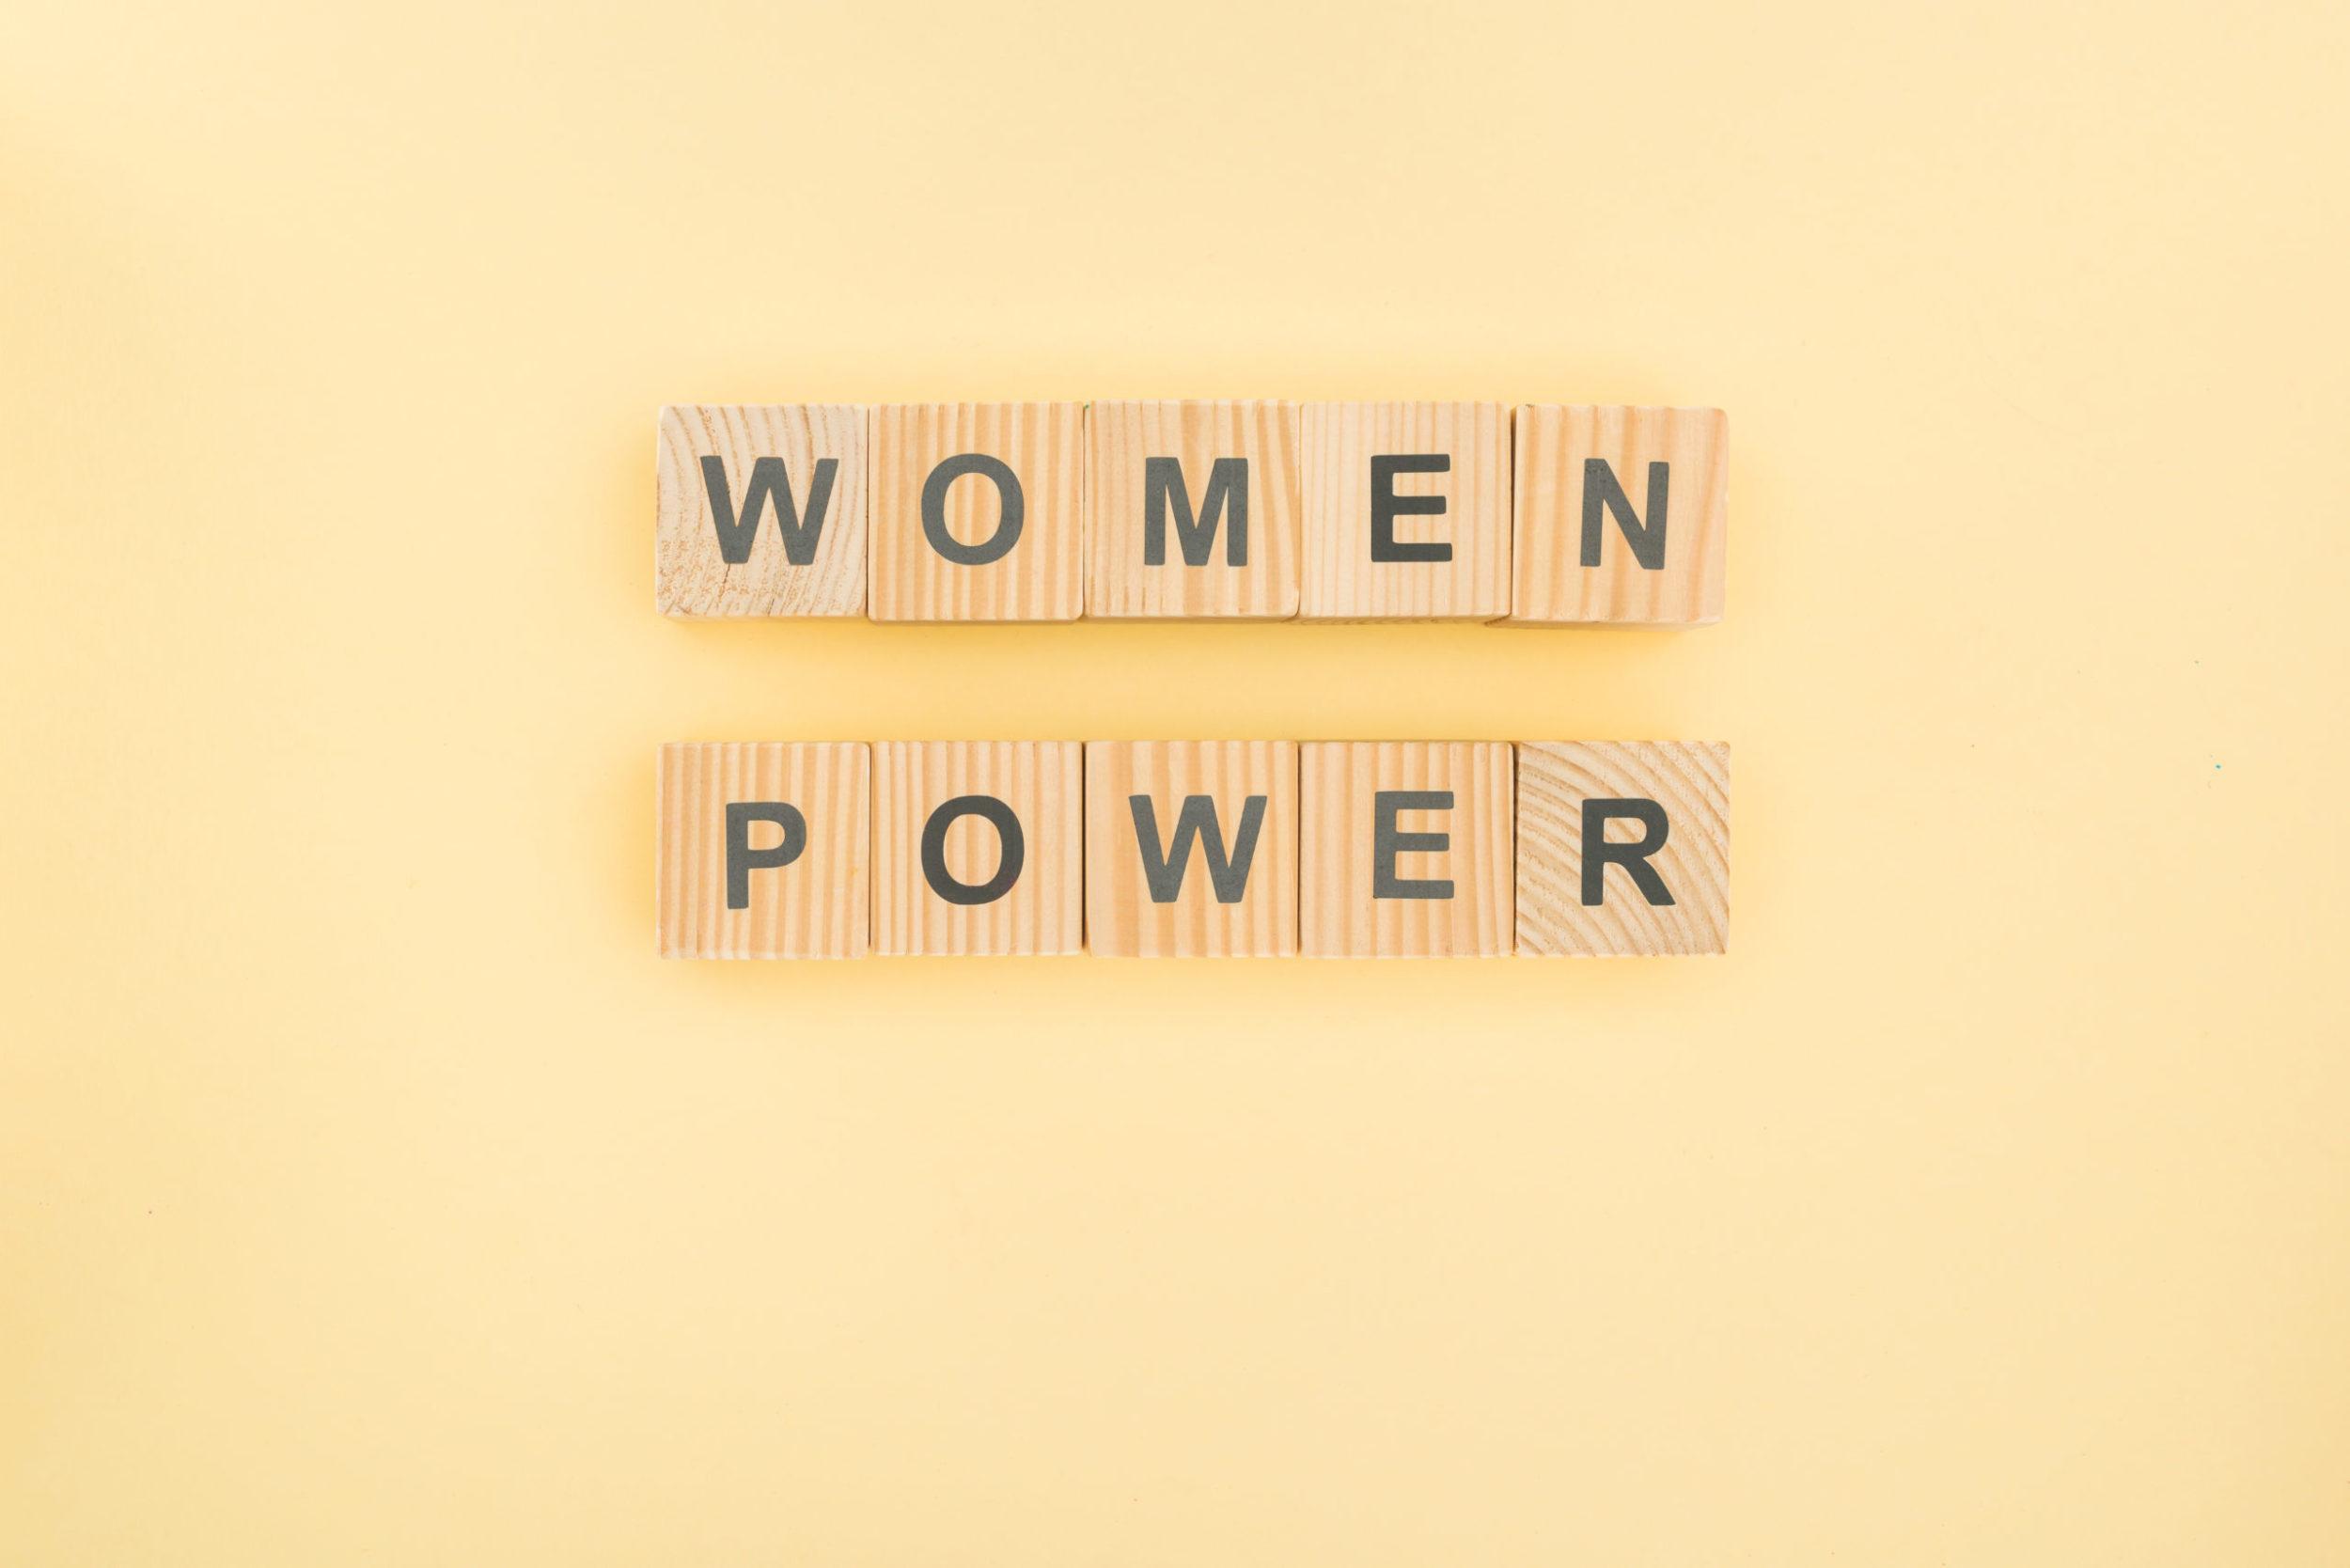 Femminismo: oltre ai social c'è di più!